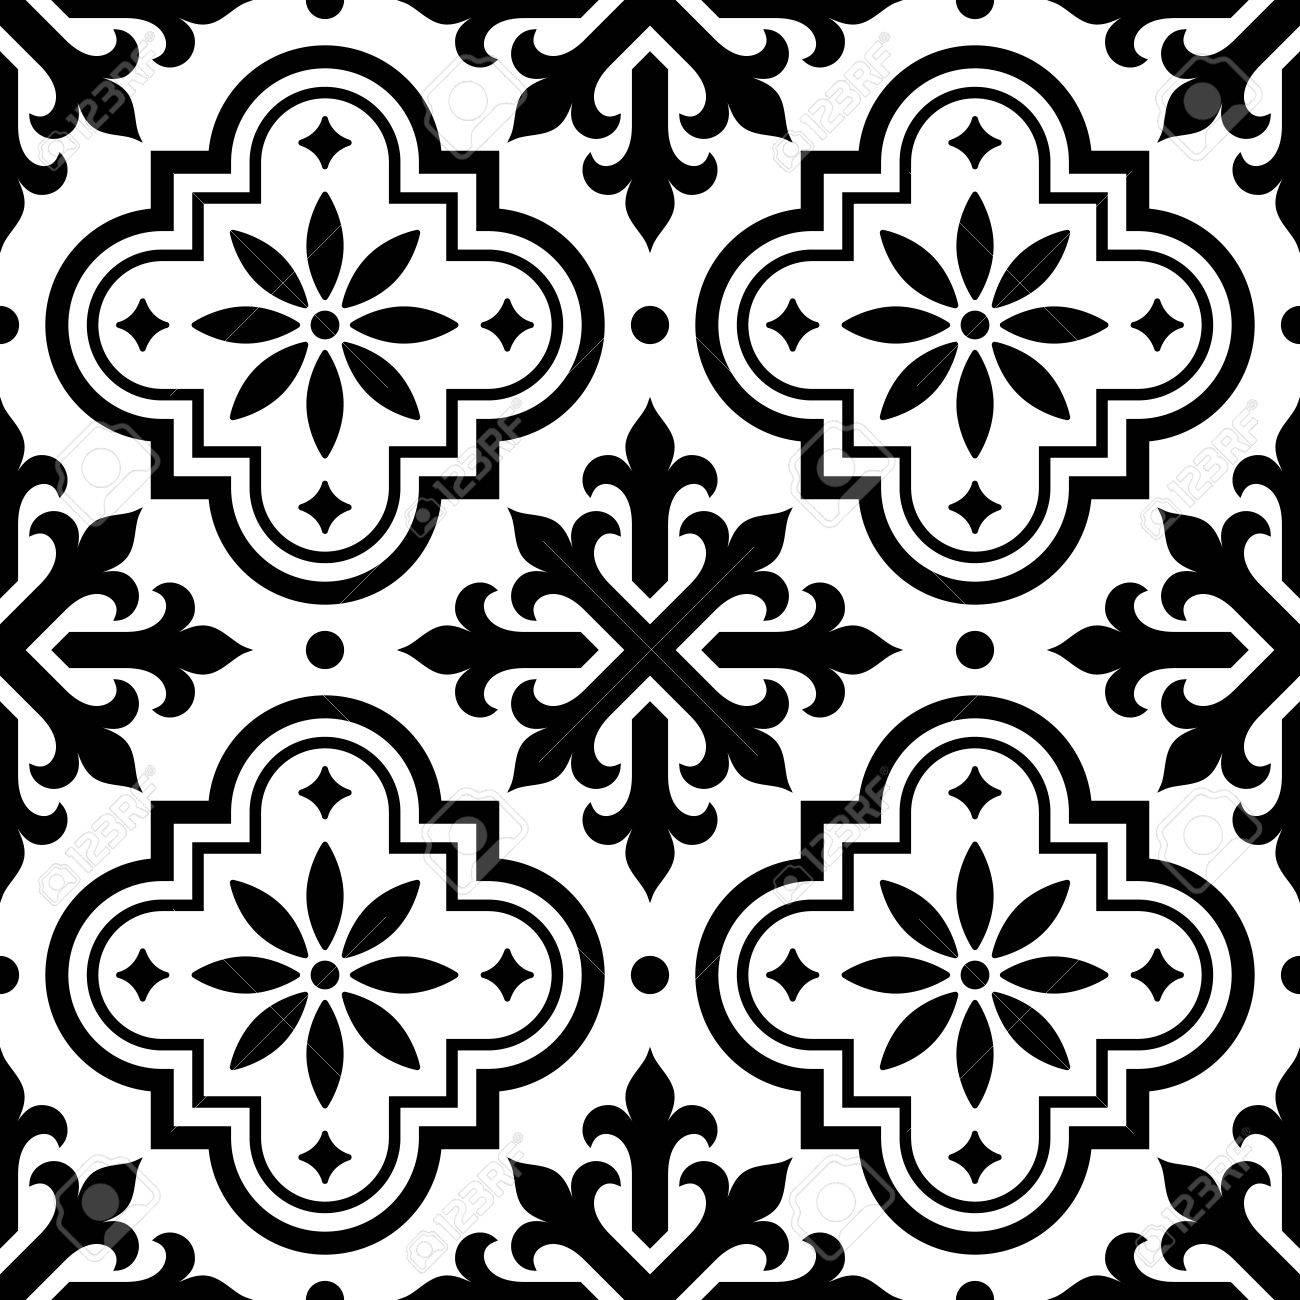 Spanish Azulejo Design And Moroccan Tiles Design Seamless Black